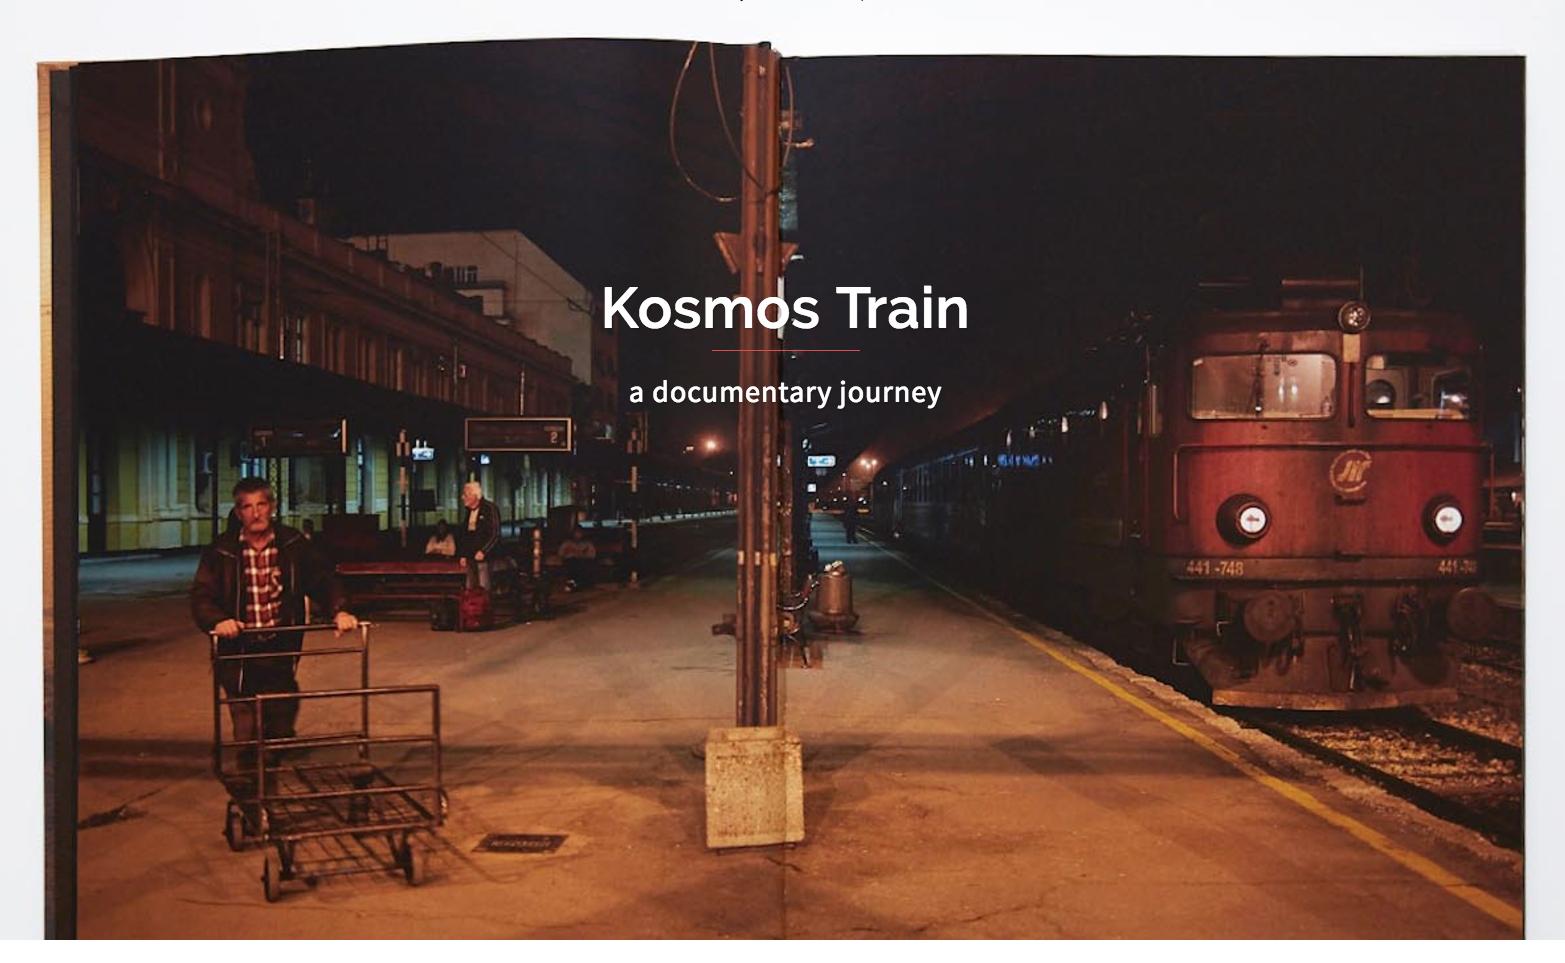 Kosmos Train Vernissage Stuttgart Rüdiger Flöge vhs-photogalerie